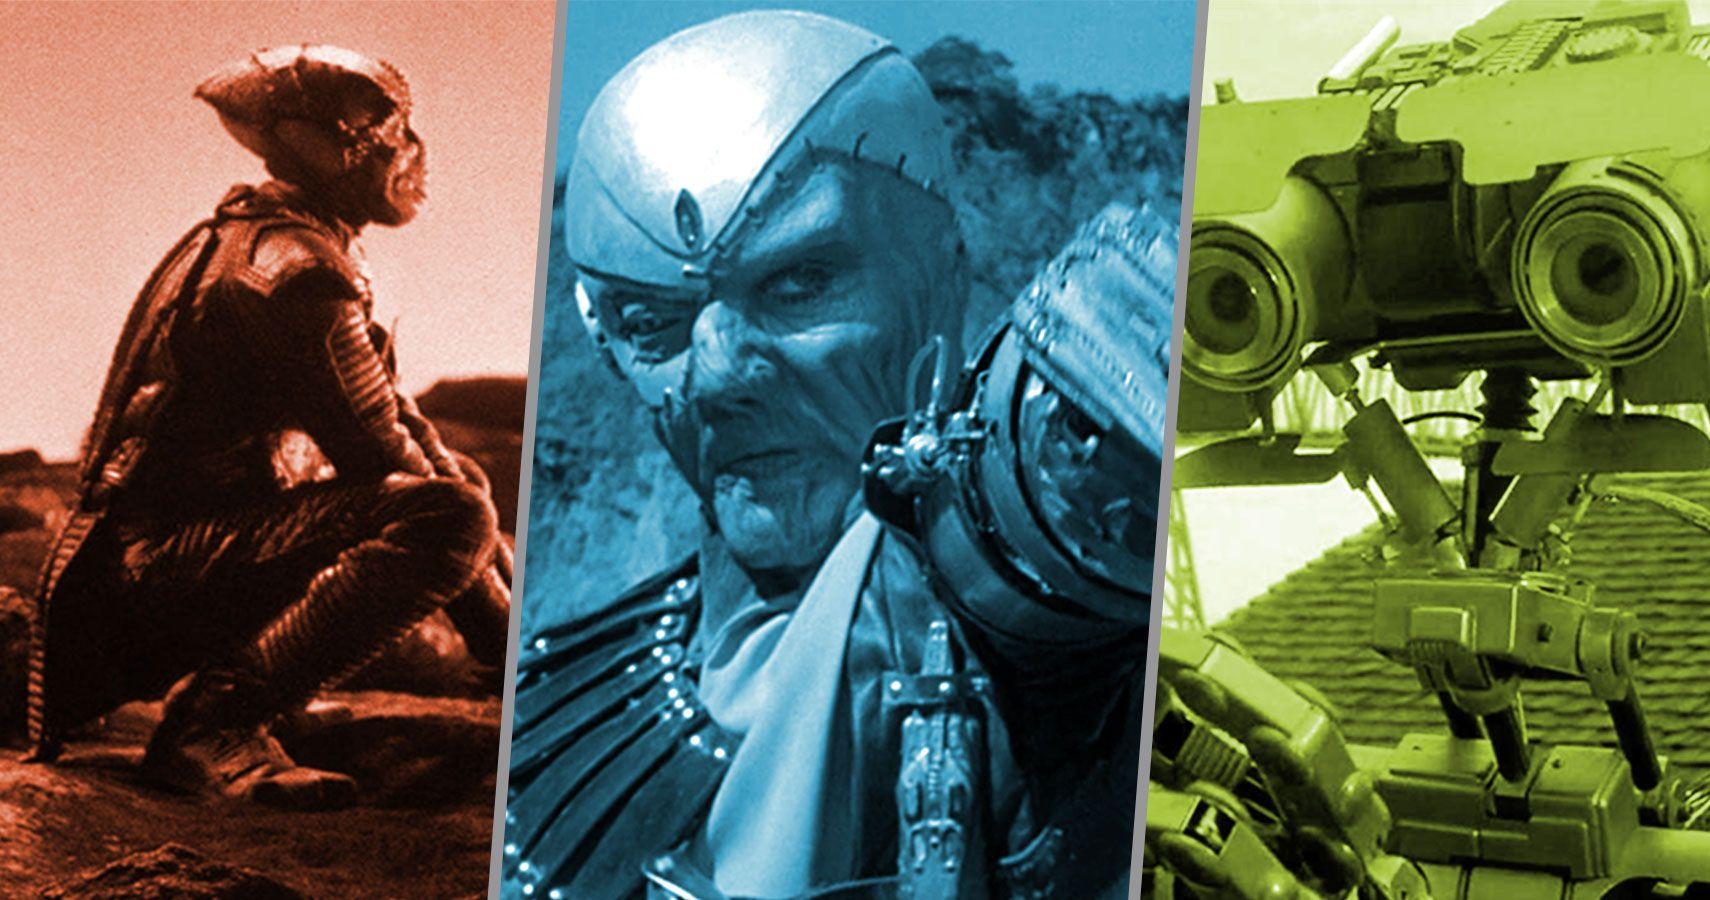 15 Forgotten 1980s Sci-Fi/Adventure Films That Were Excellent